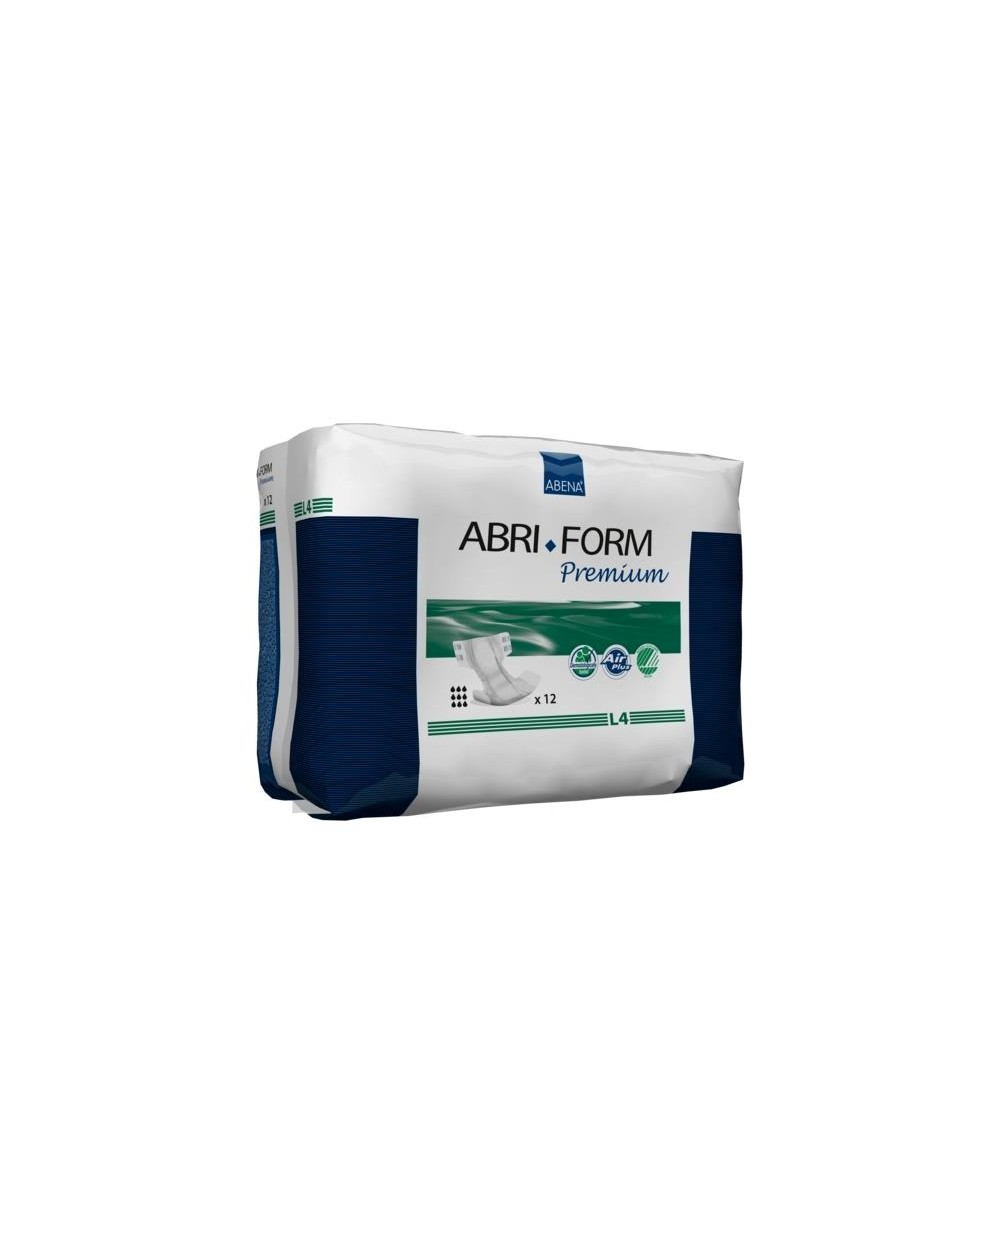 Abena Abri-Form 4 Large - 12 protections